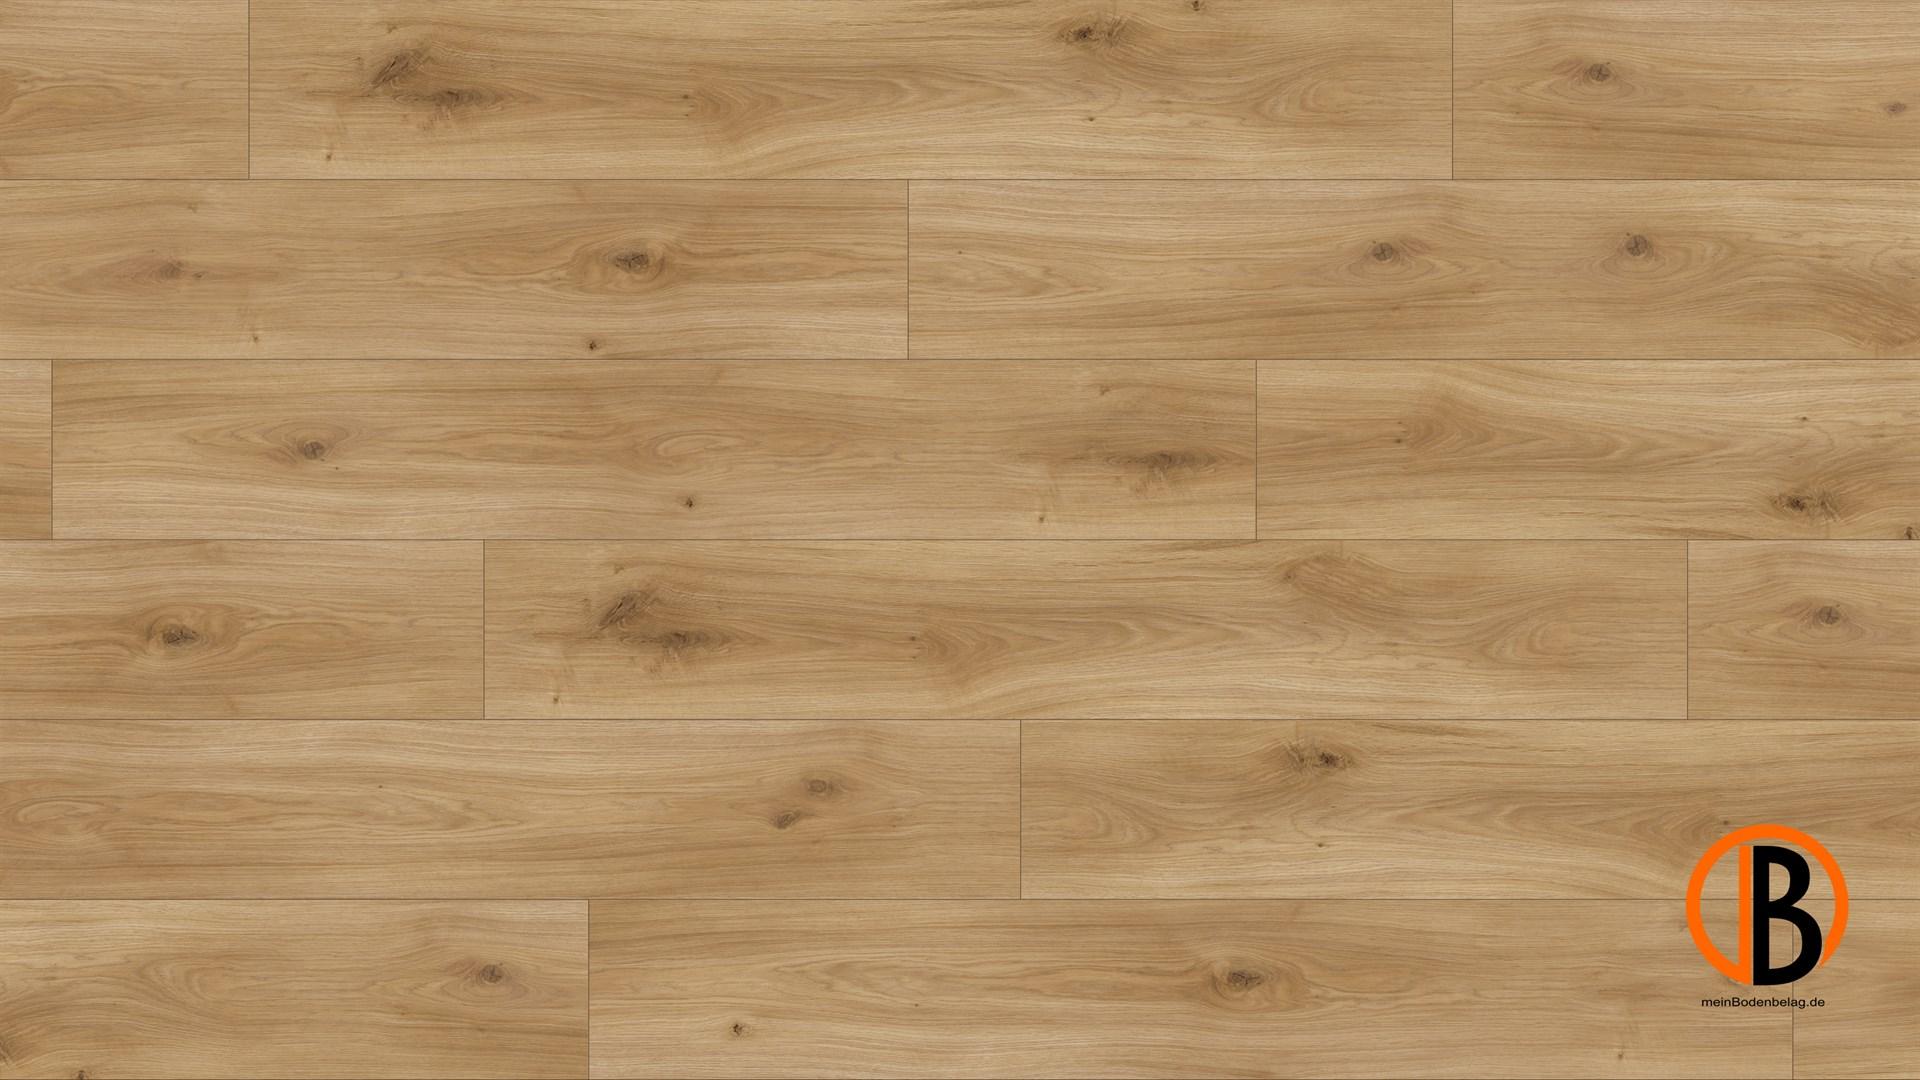 parador laminat basic 400 m4v eiche horizont natur seidem struk lhd minifase. Black Bedroom Furniture Sets. Home Design Ideas